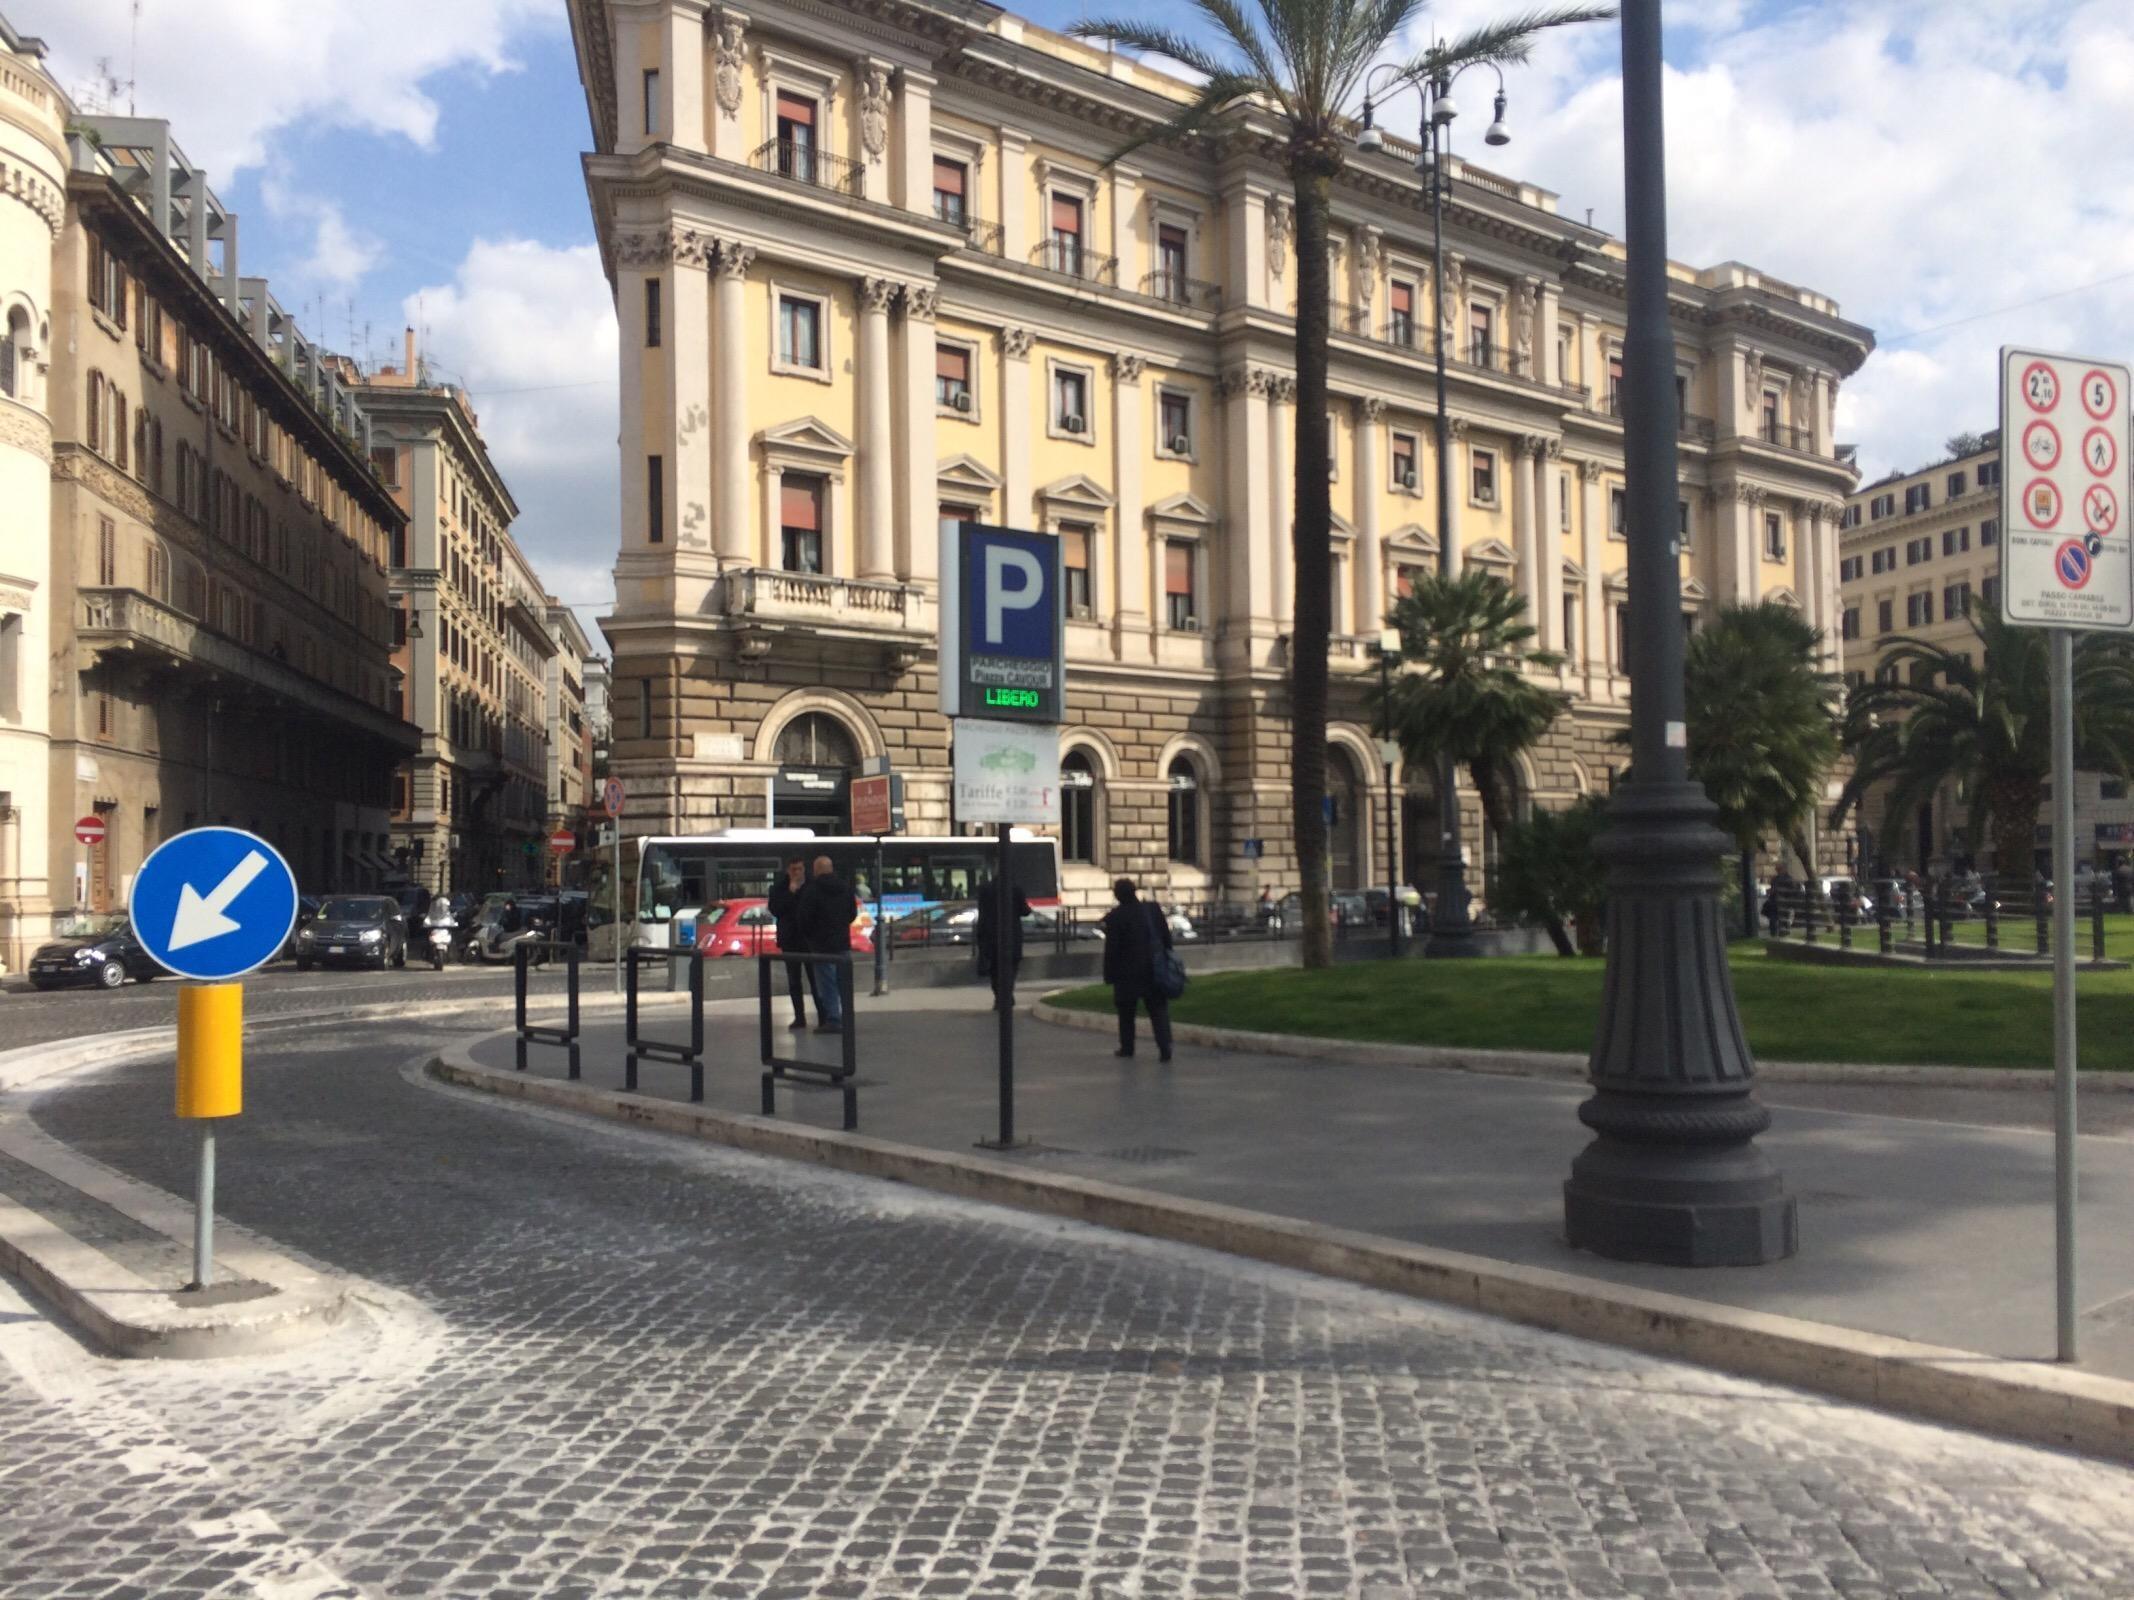 Parcheggio Piazza Cavour Parking